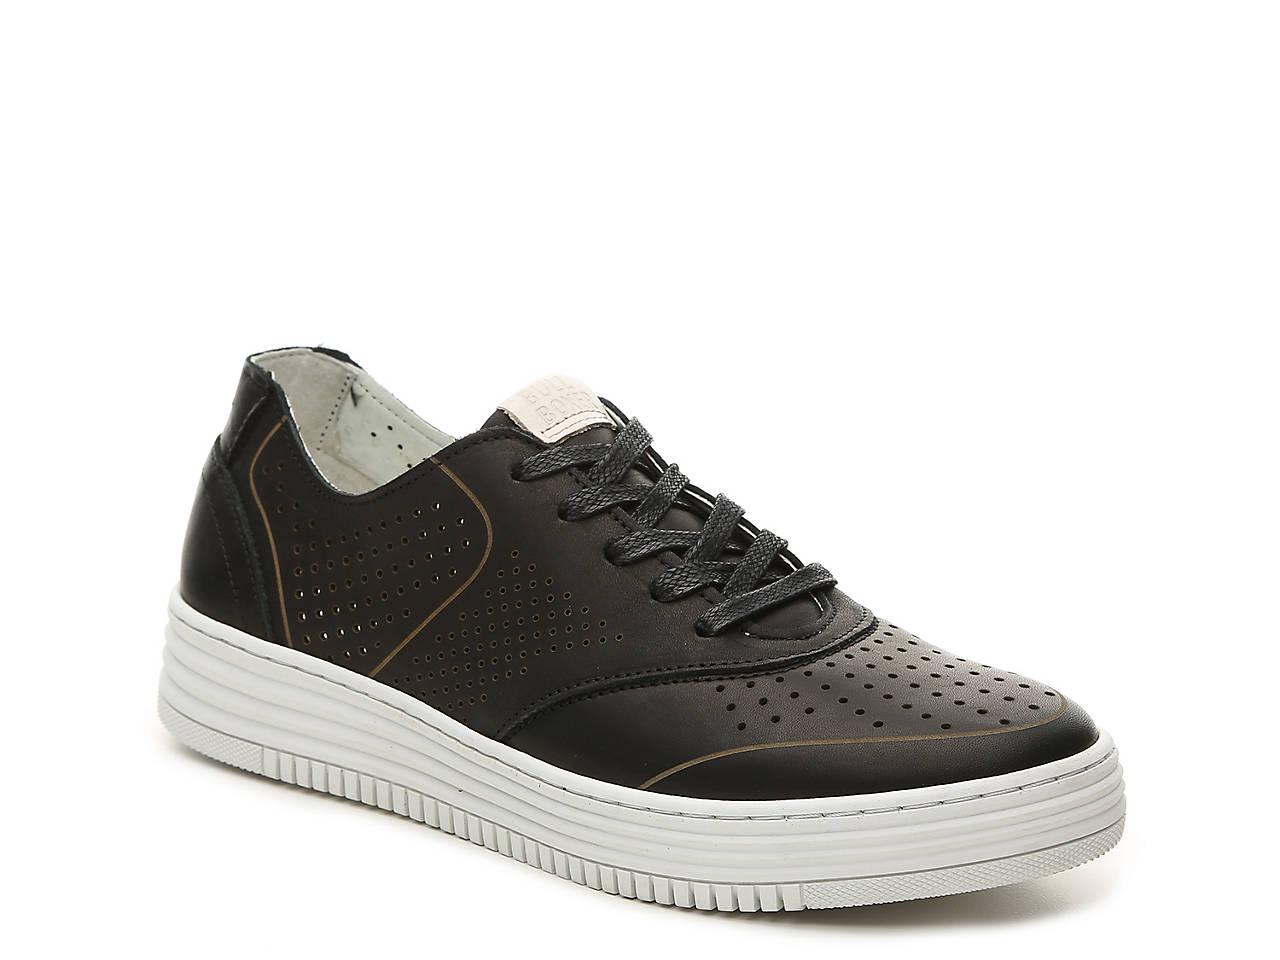 Sneakers, Womens Sneakers Bullboxer